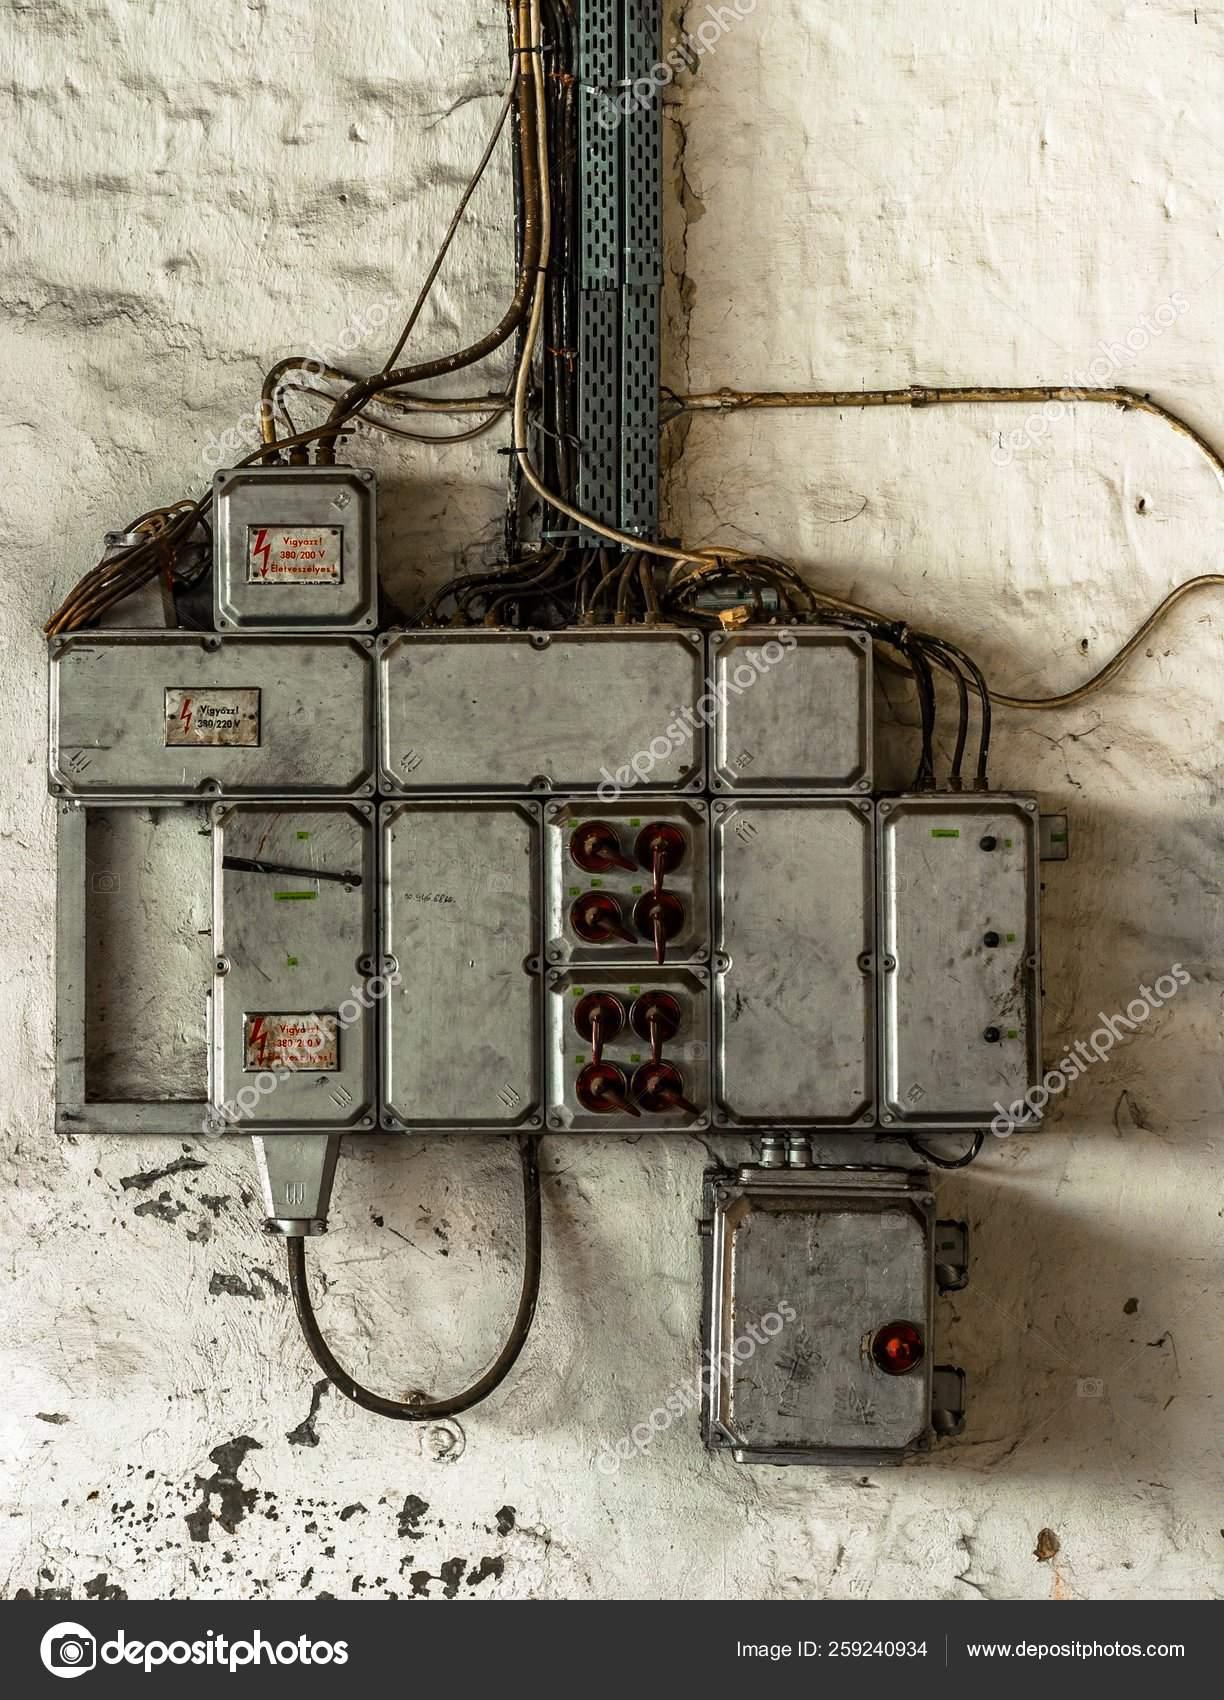 [SCHEMATICS_48YU]  Industrial Fuse Box Wall Closeup Photo — Stock Photo © YAYImages #259240934 | Industrial Fuse Box |  | Depositphotos